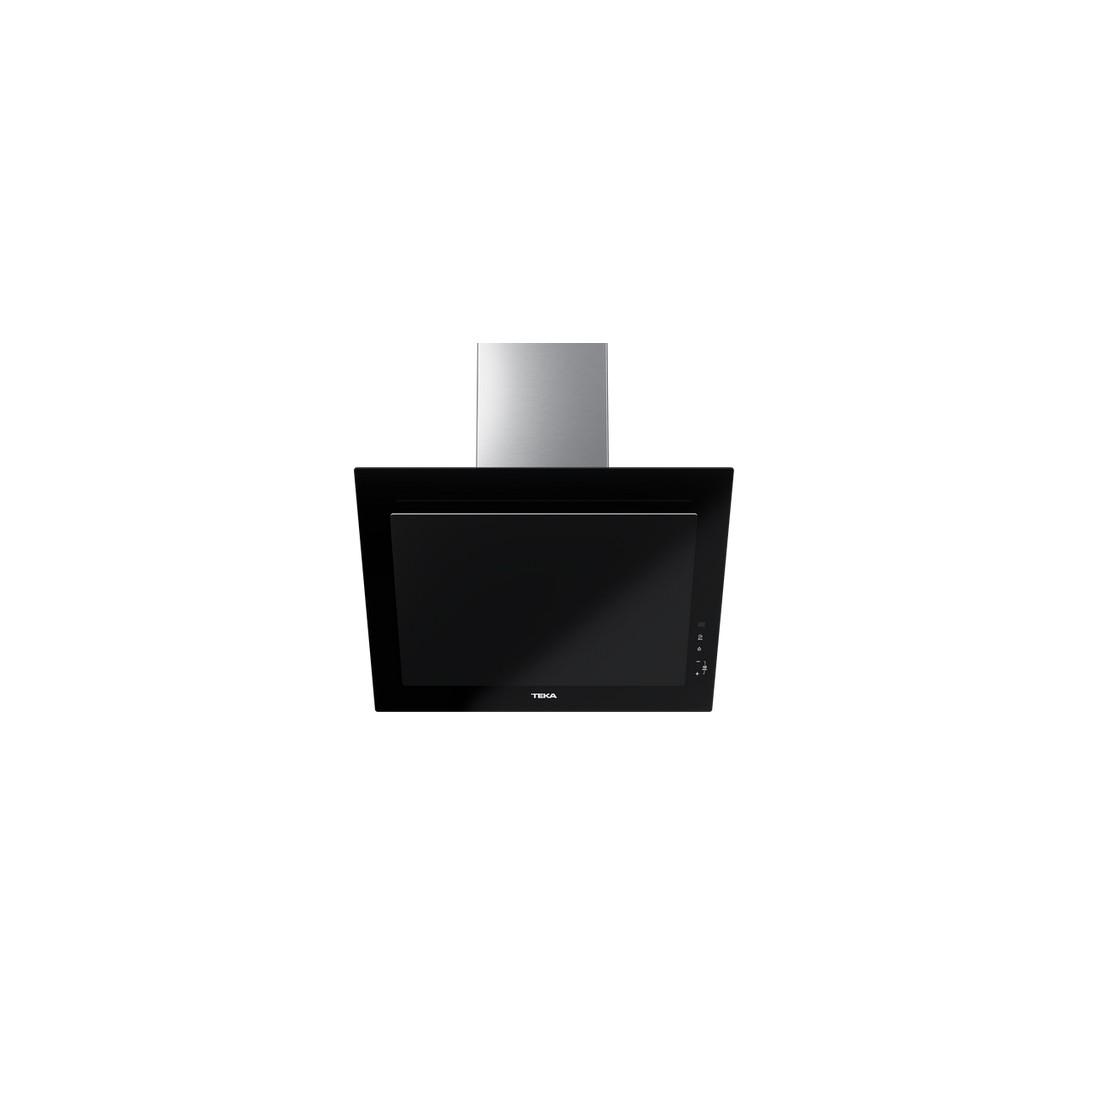 Campana Decorativa - Teka DVT 68660 TBS BK, 60 cm, Negro